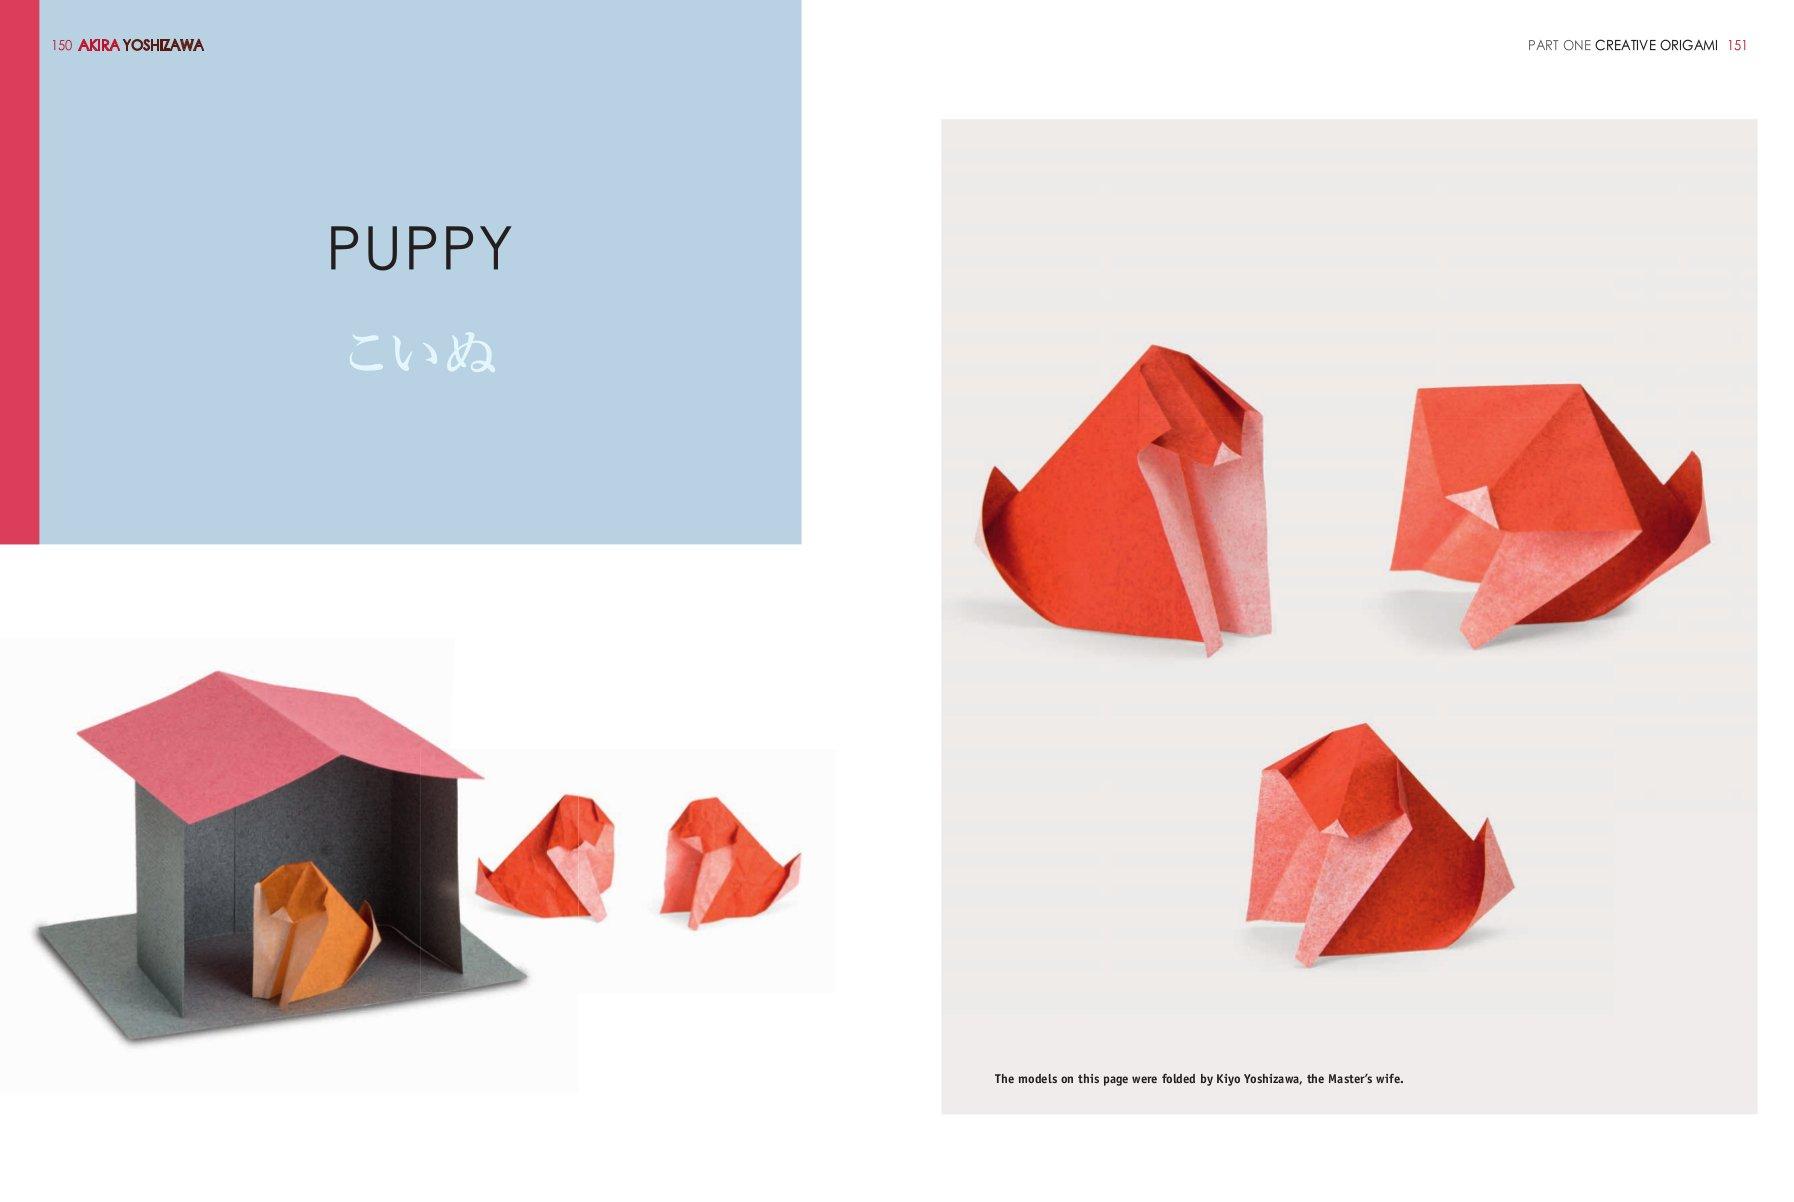 Akira yoshizawa japans greatest origami master featuring over akira yoshizawa japans greatest origami master featuring over 60 models and 1000 diagrams by the master akira yoshizawa robert j lang kazuo hamada jeuxipadfo Image collections